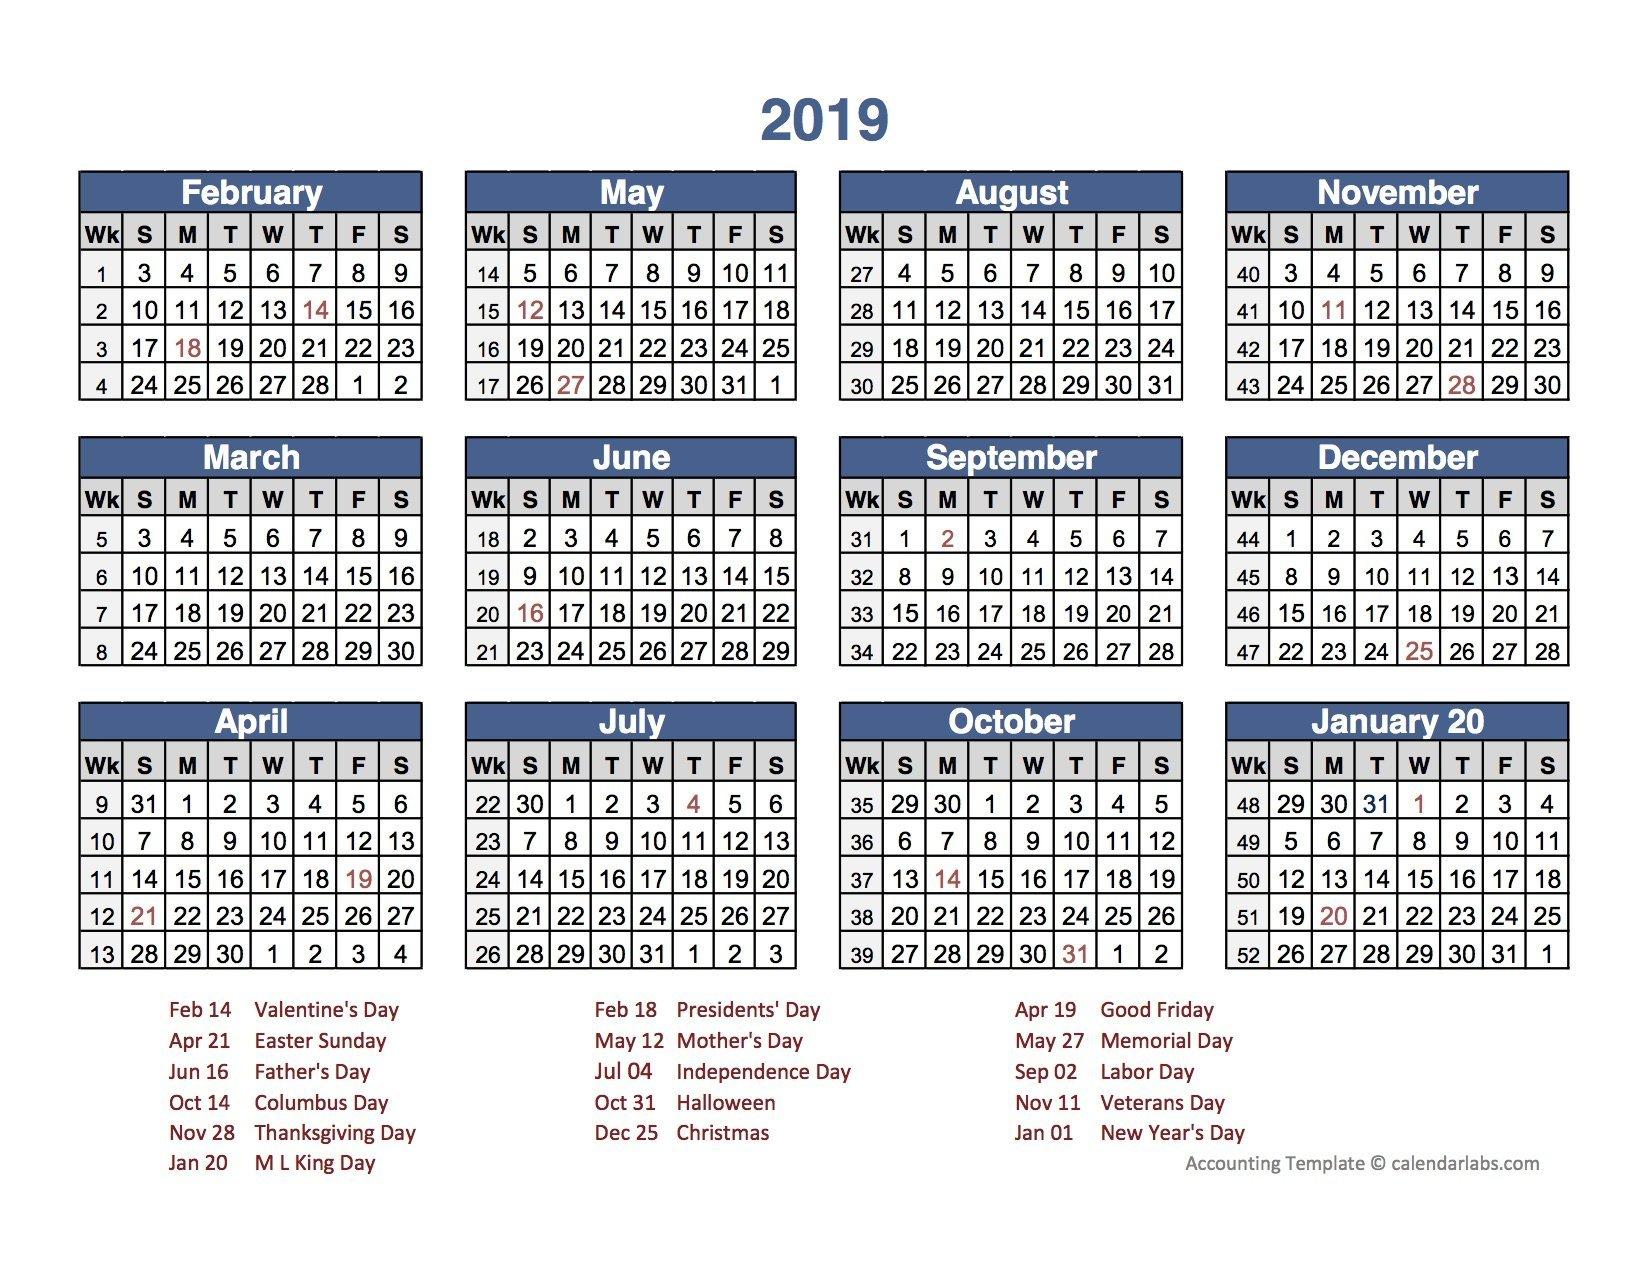 Business Calendars 2019 To Download Or Print | Americanwomanmag 2019 Calendar 4 4 5